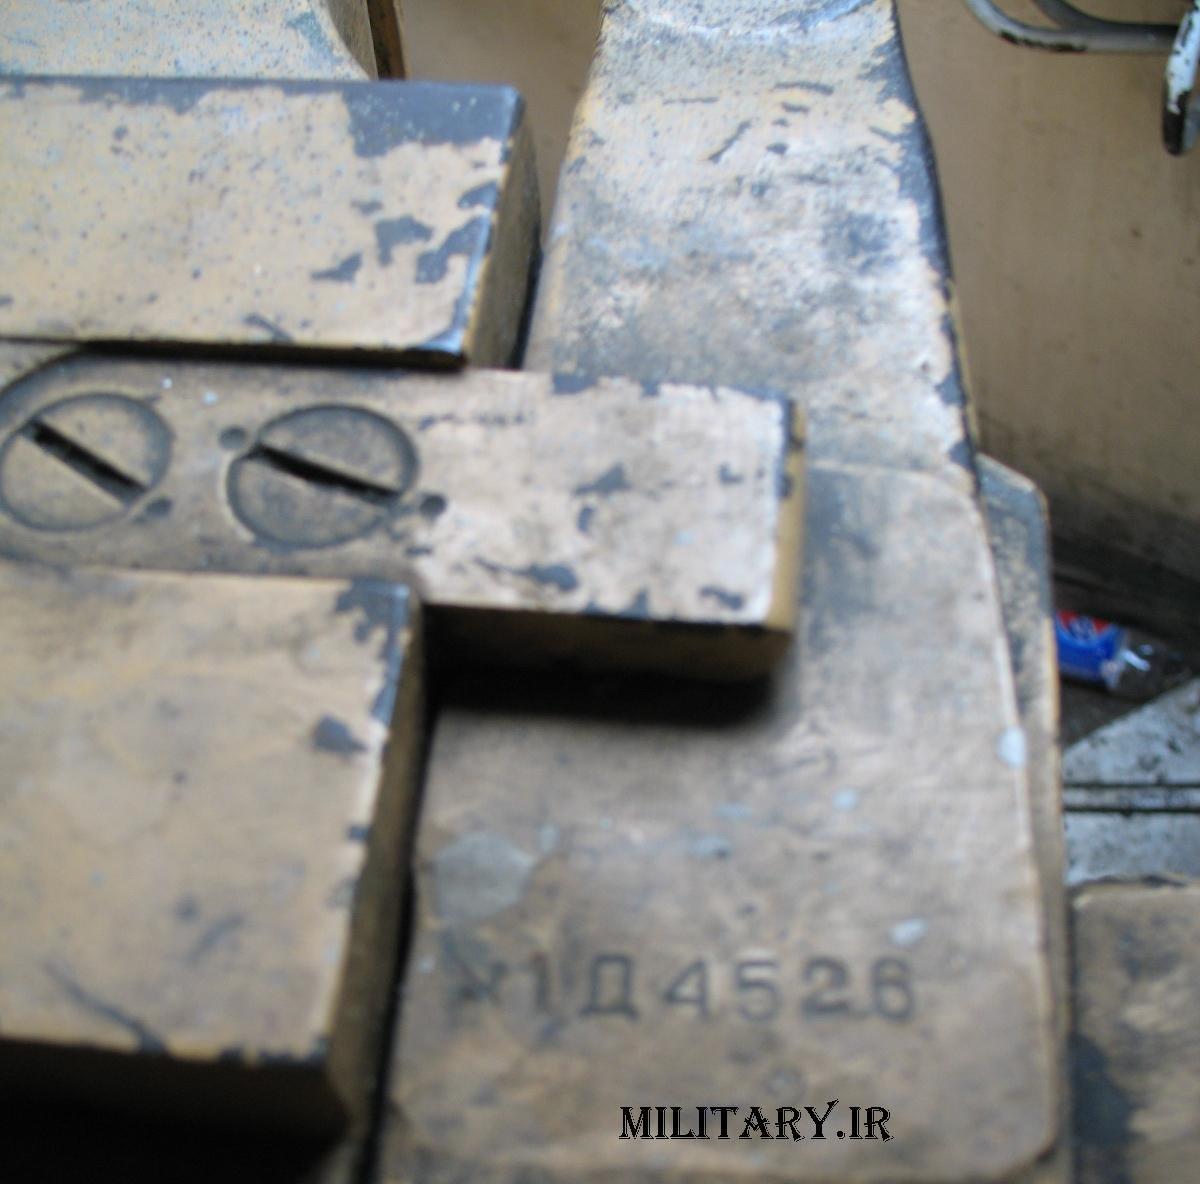 http://gallery.military.ir/albums/userpics/Zulfiqar1_%2821%29.JPG